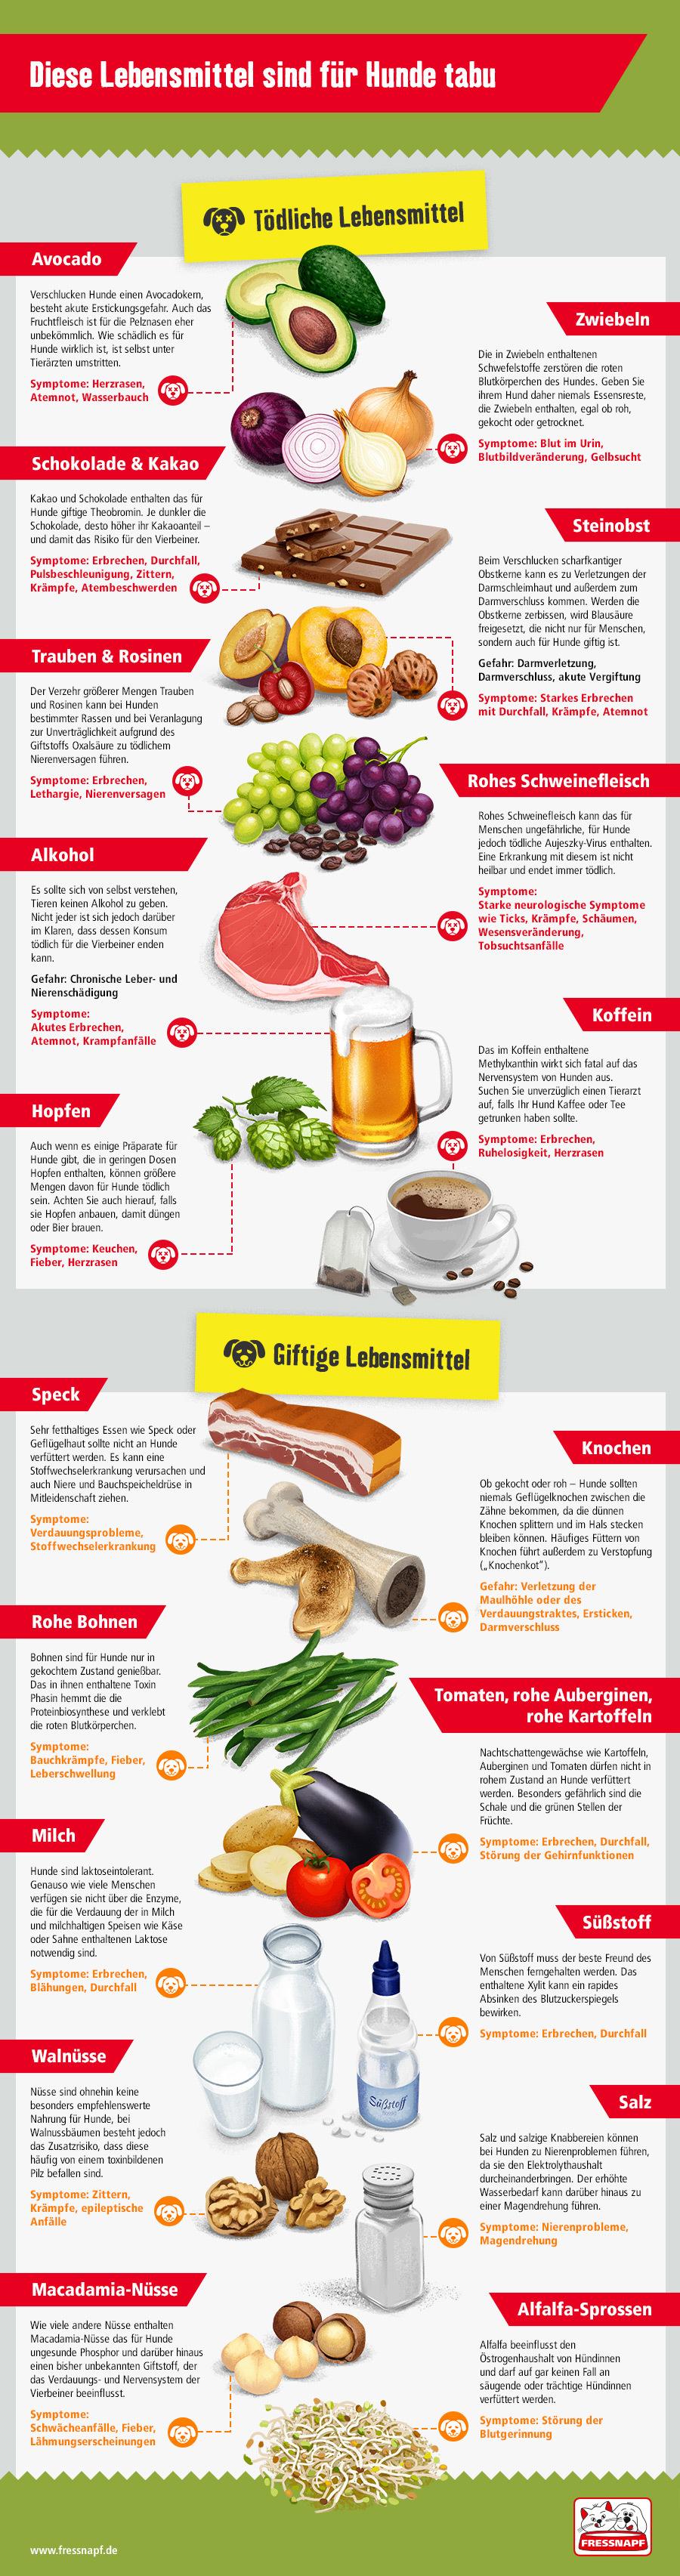 Hundefutter Selber Kochen Rezepte Fressnapf